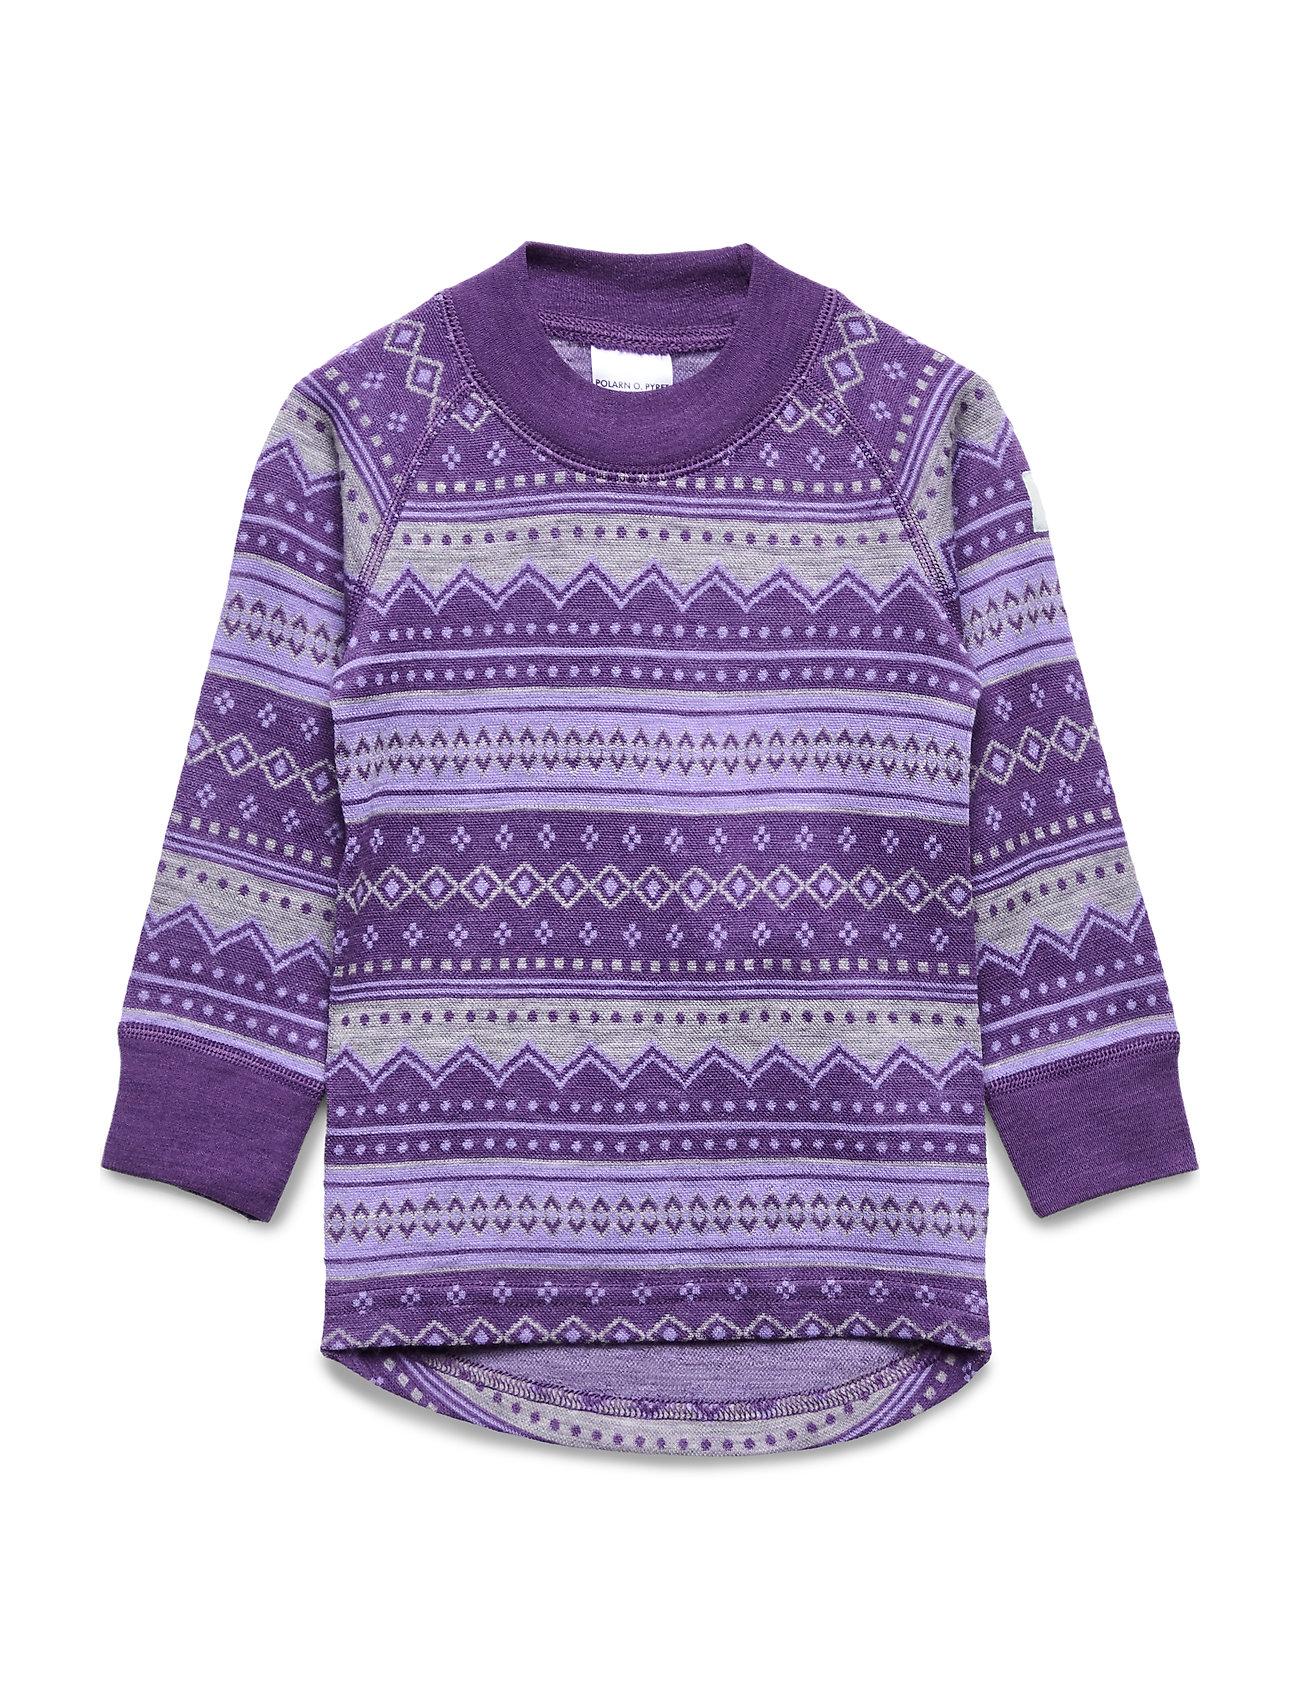 Polarn O. Pyret Top Wool Jaquard Pre school - ASTER PURPLE